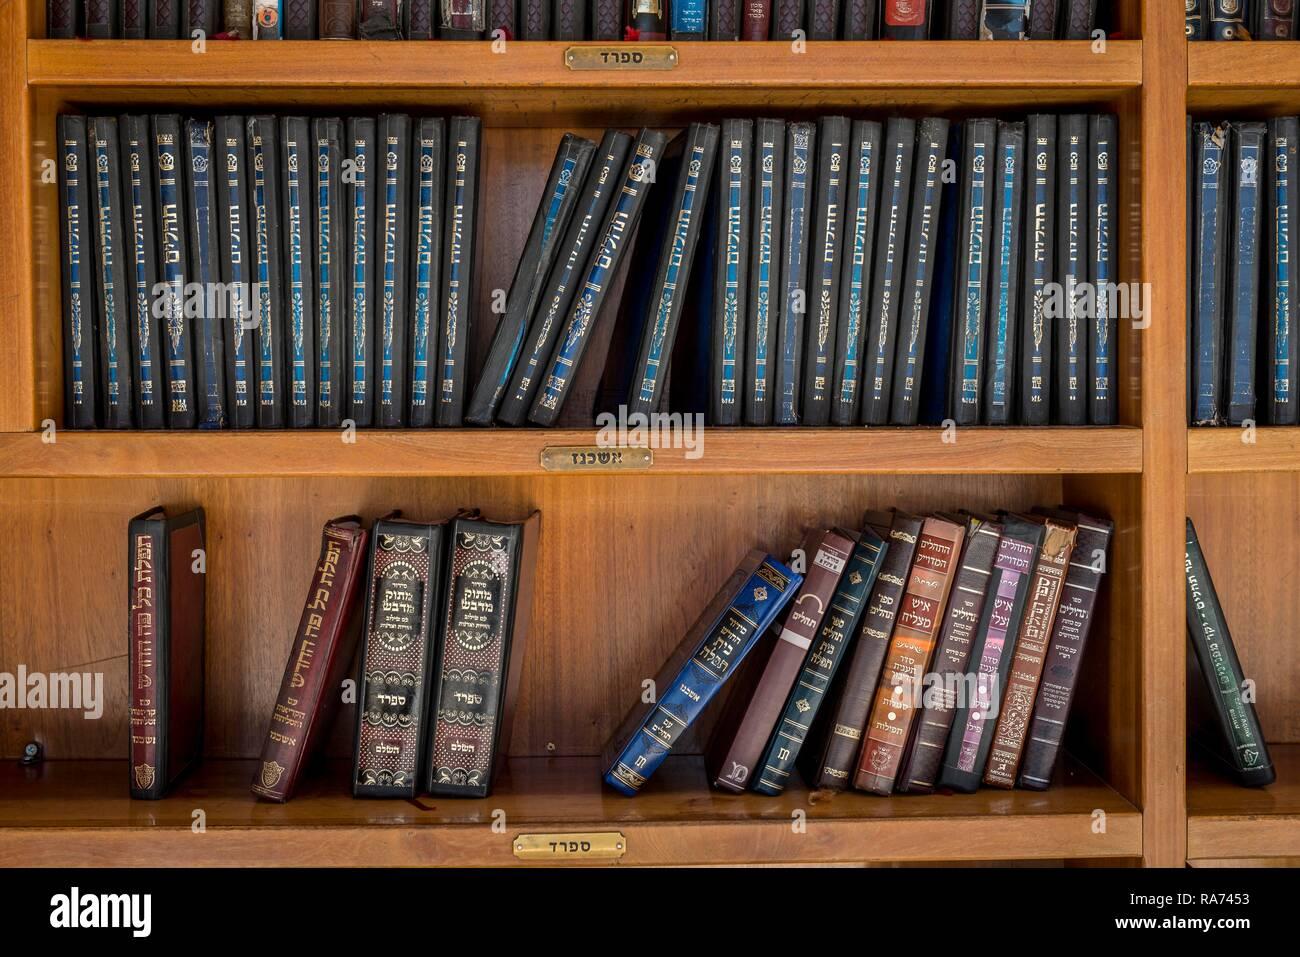 Hebrew books on the shelf, Old synagogue, David's tomb, tomb of the biblical king David, David's city, Jerusalem, Israel - Stock Image